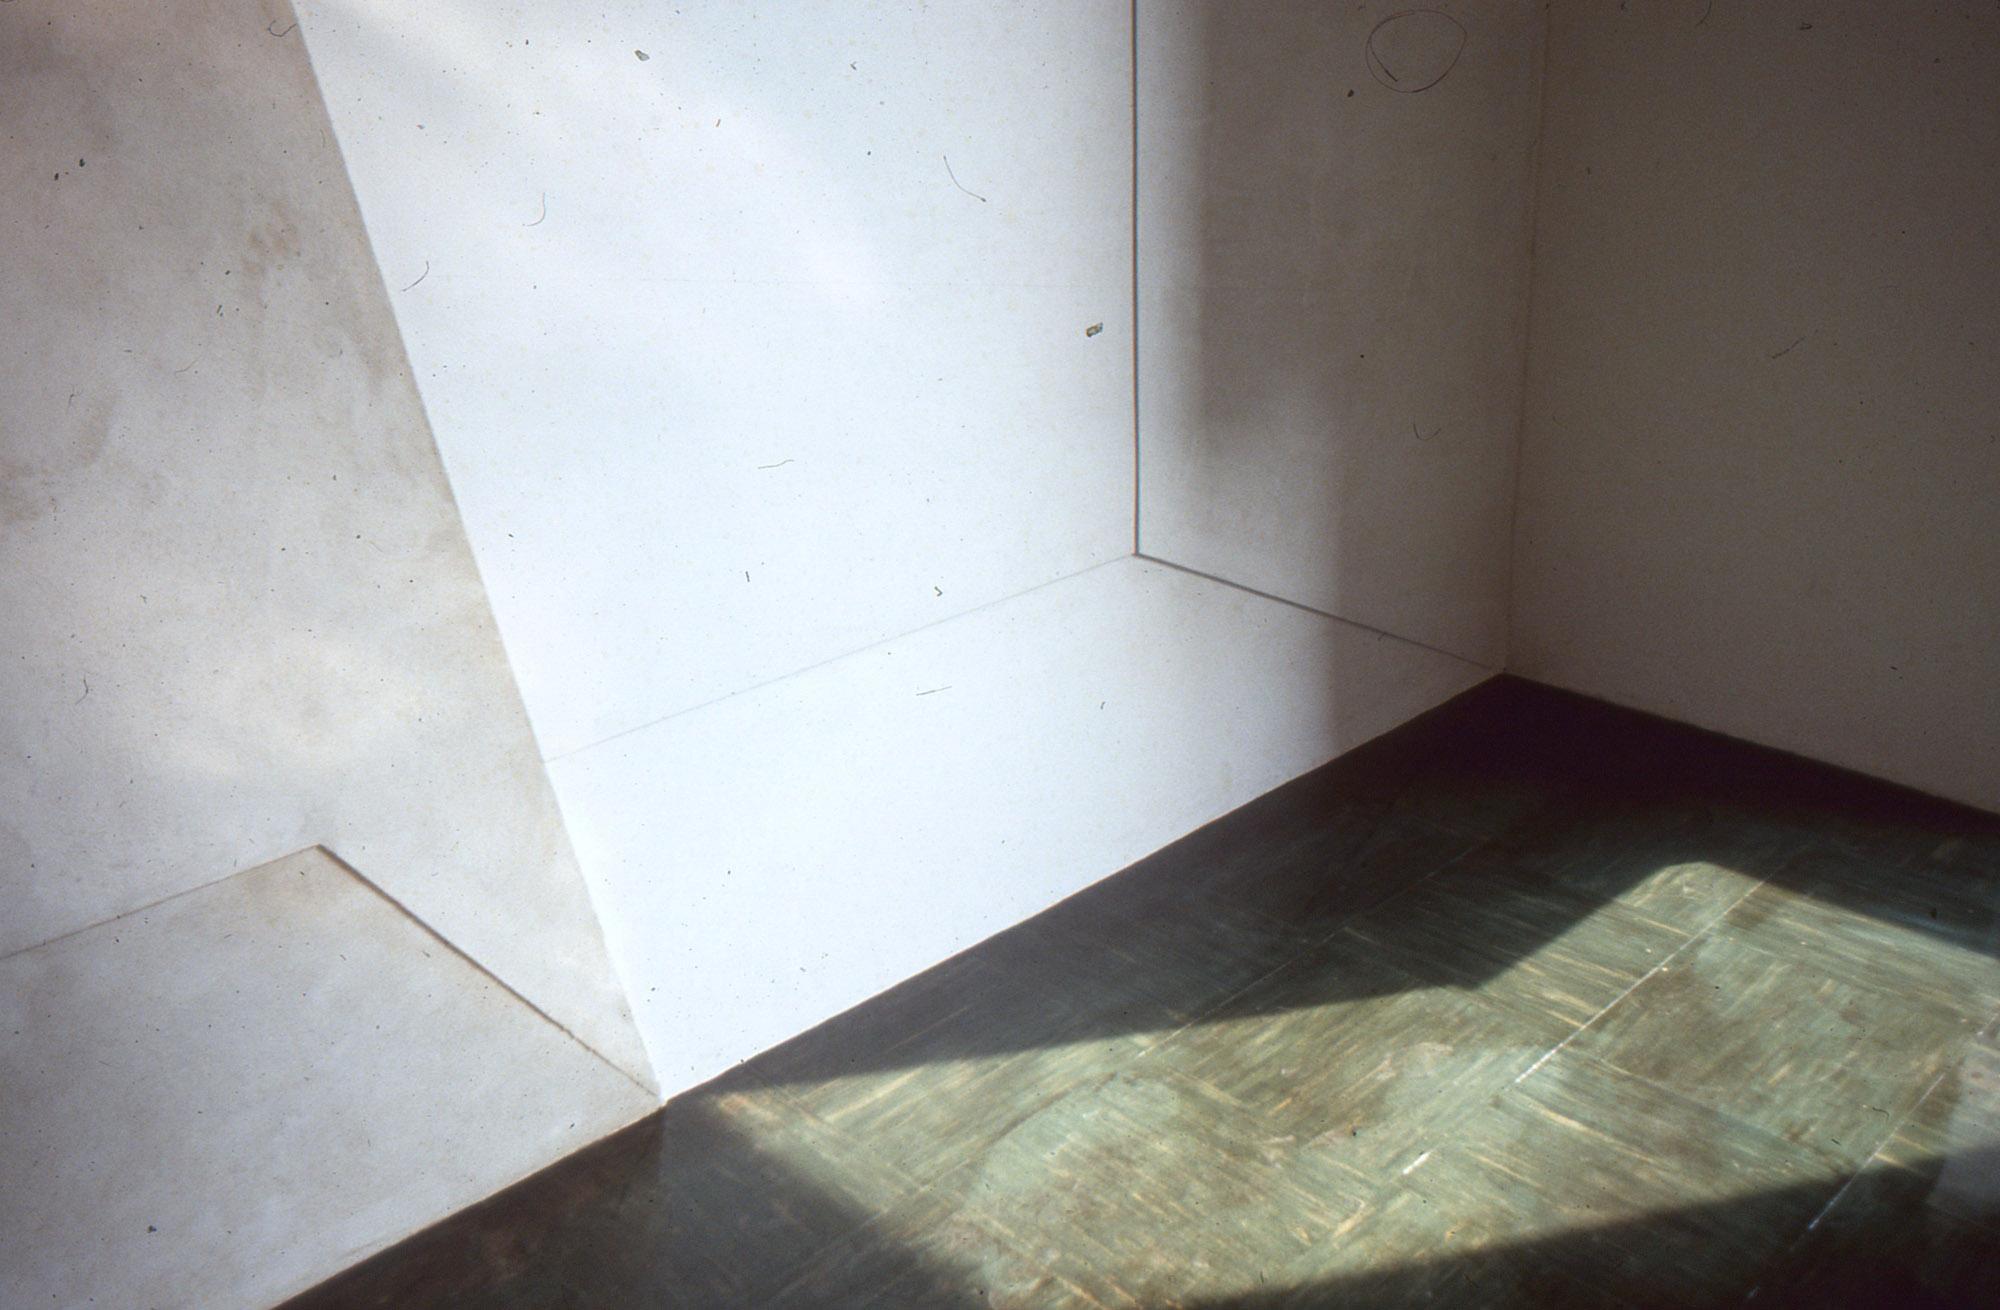 Stephen-Cox-Relief-Mirror-I-1979-vi.jpg